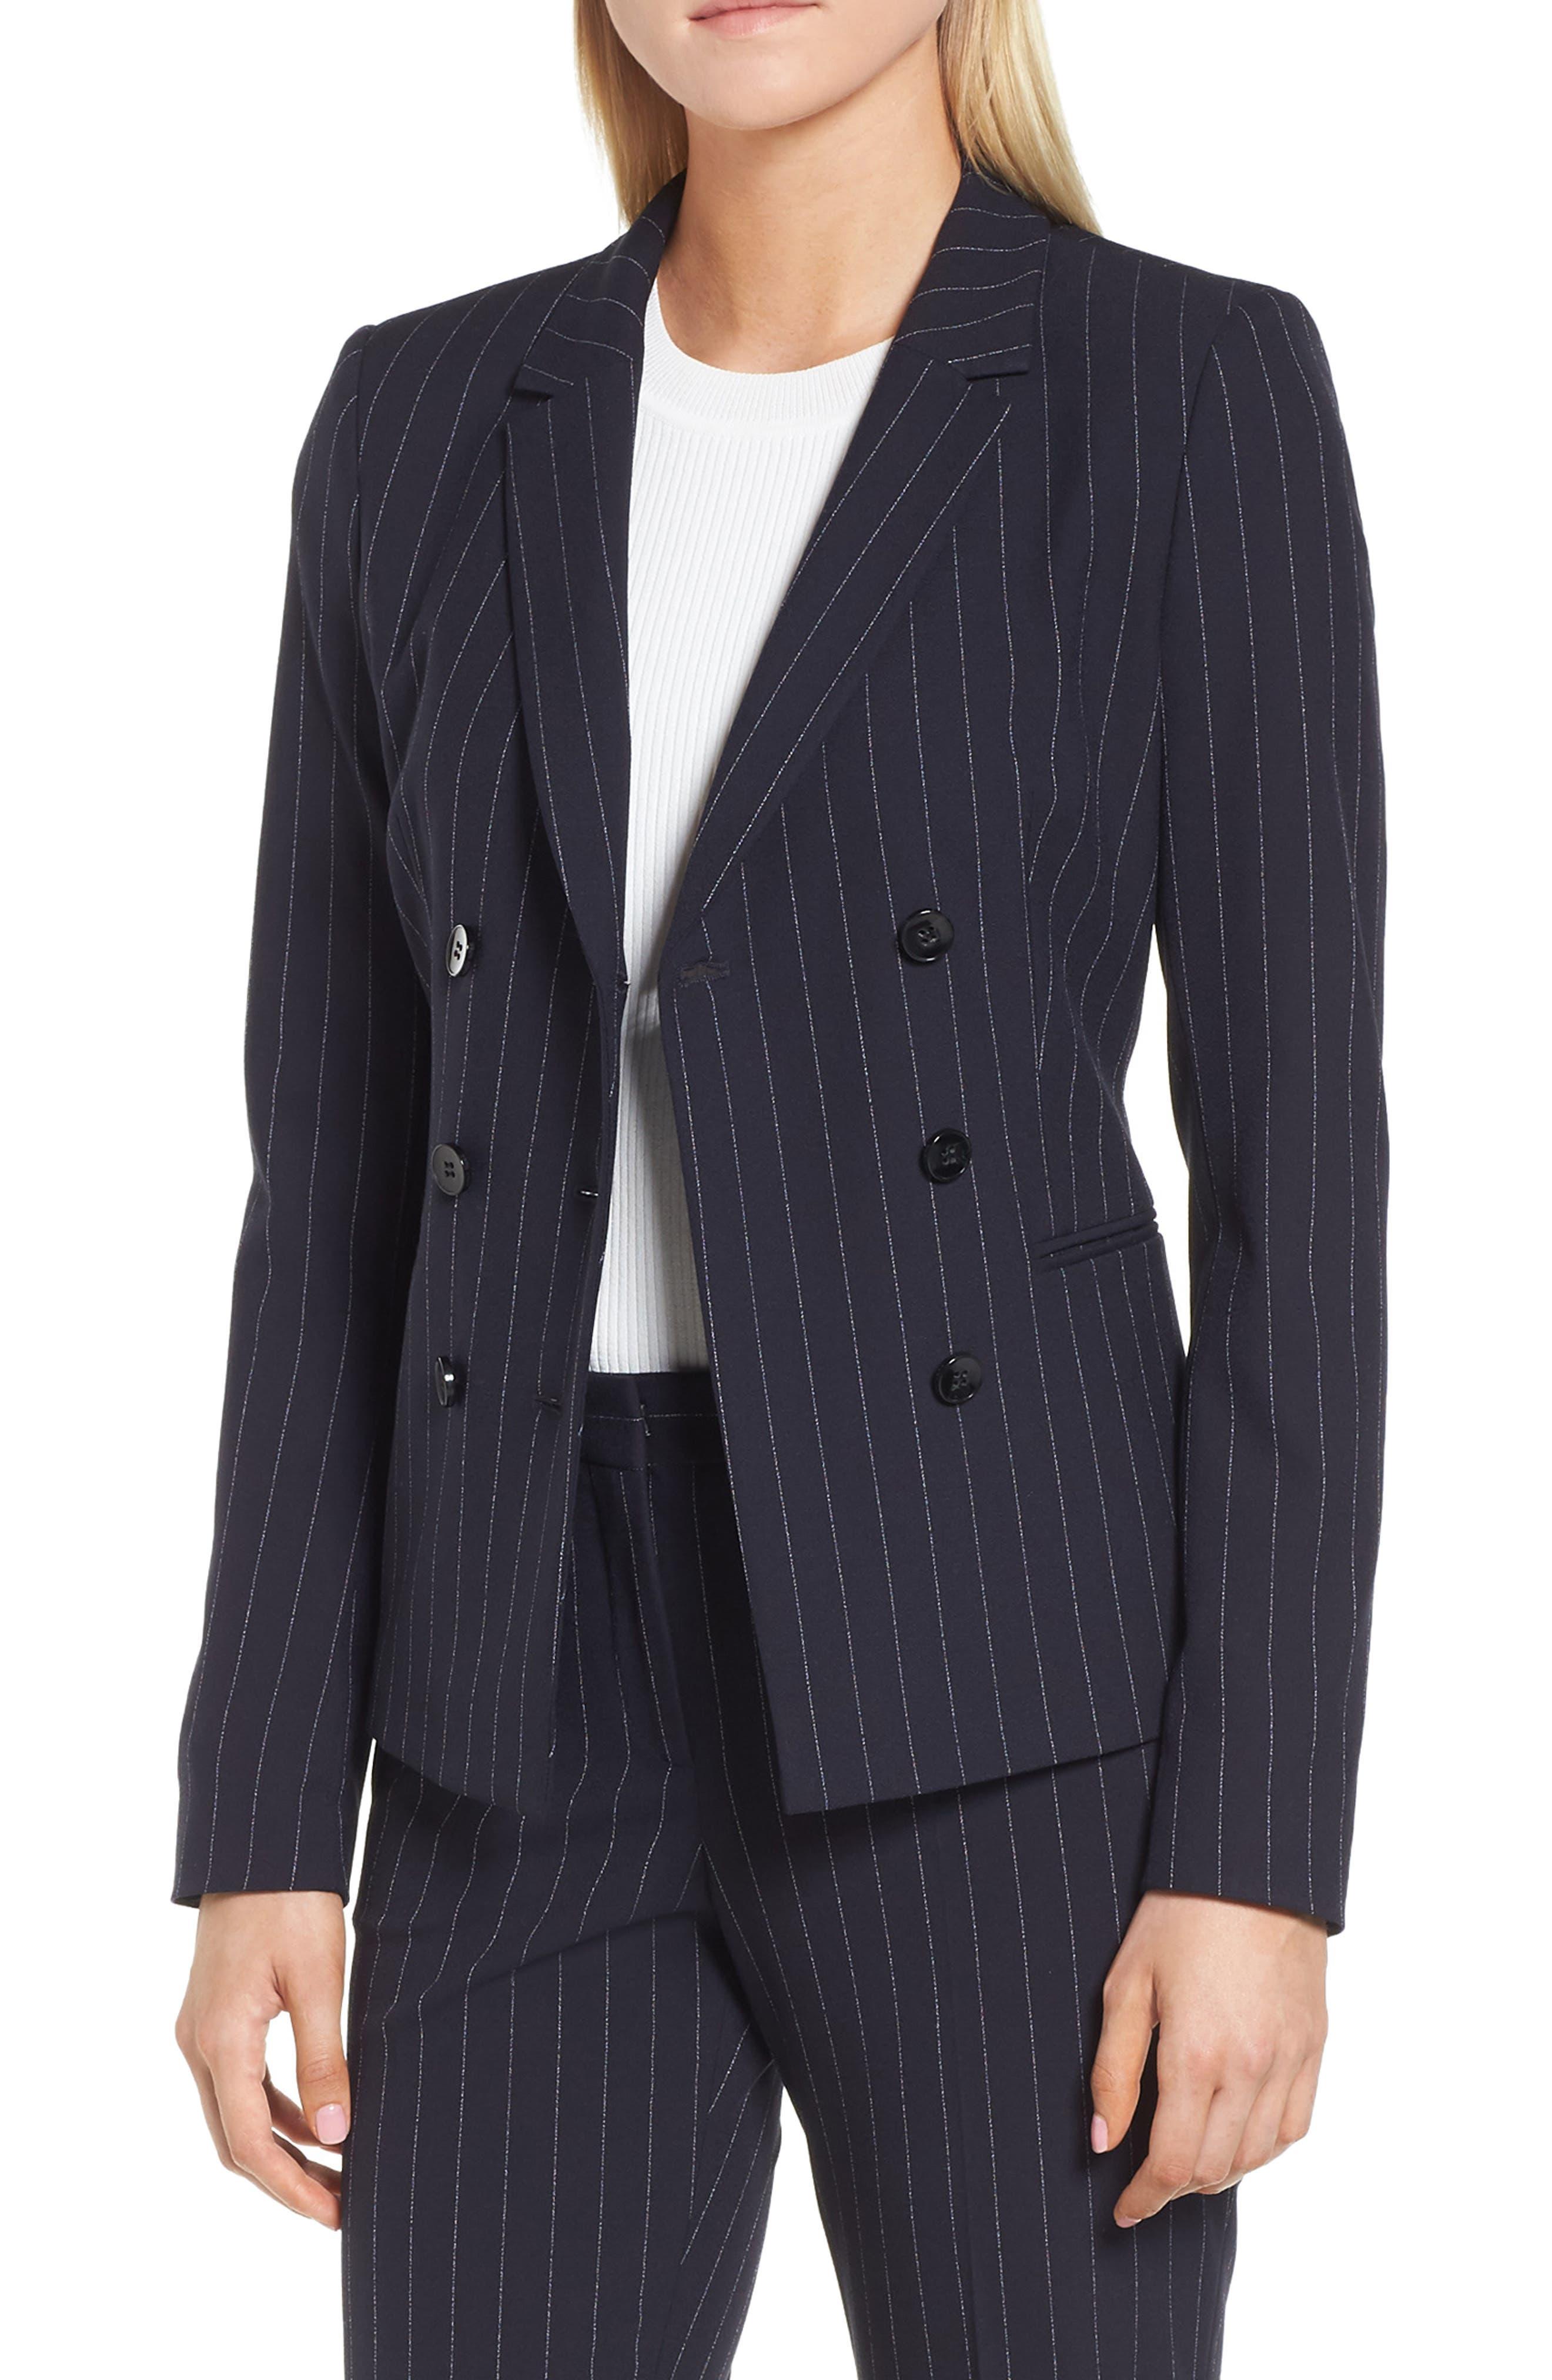 Jelaya Double Breasted Suit Jacket,                             Main thumbnail 1, color,                             Navy Fantasy